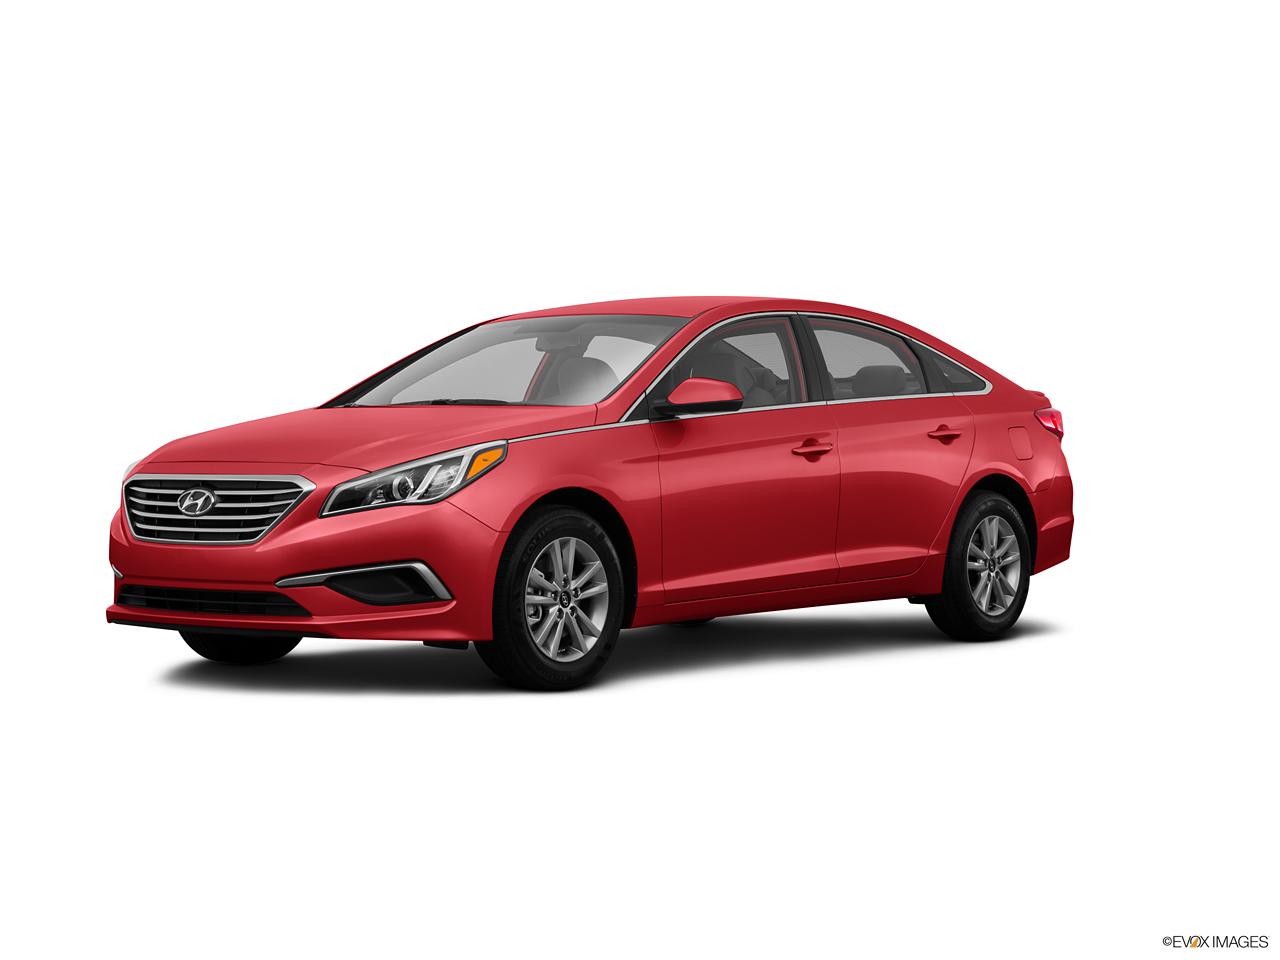 Hyundai Accent Hatchback 2017 Review >> Hyundai Sonata 2017 2.4L Base in UAE: New Car Prices, Specs, Reviews & Photos | YallaMotor